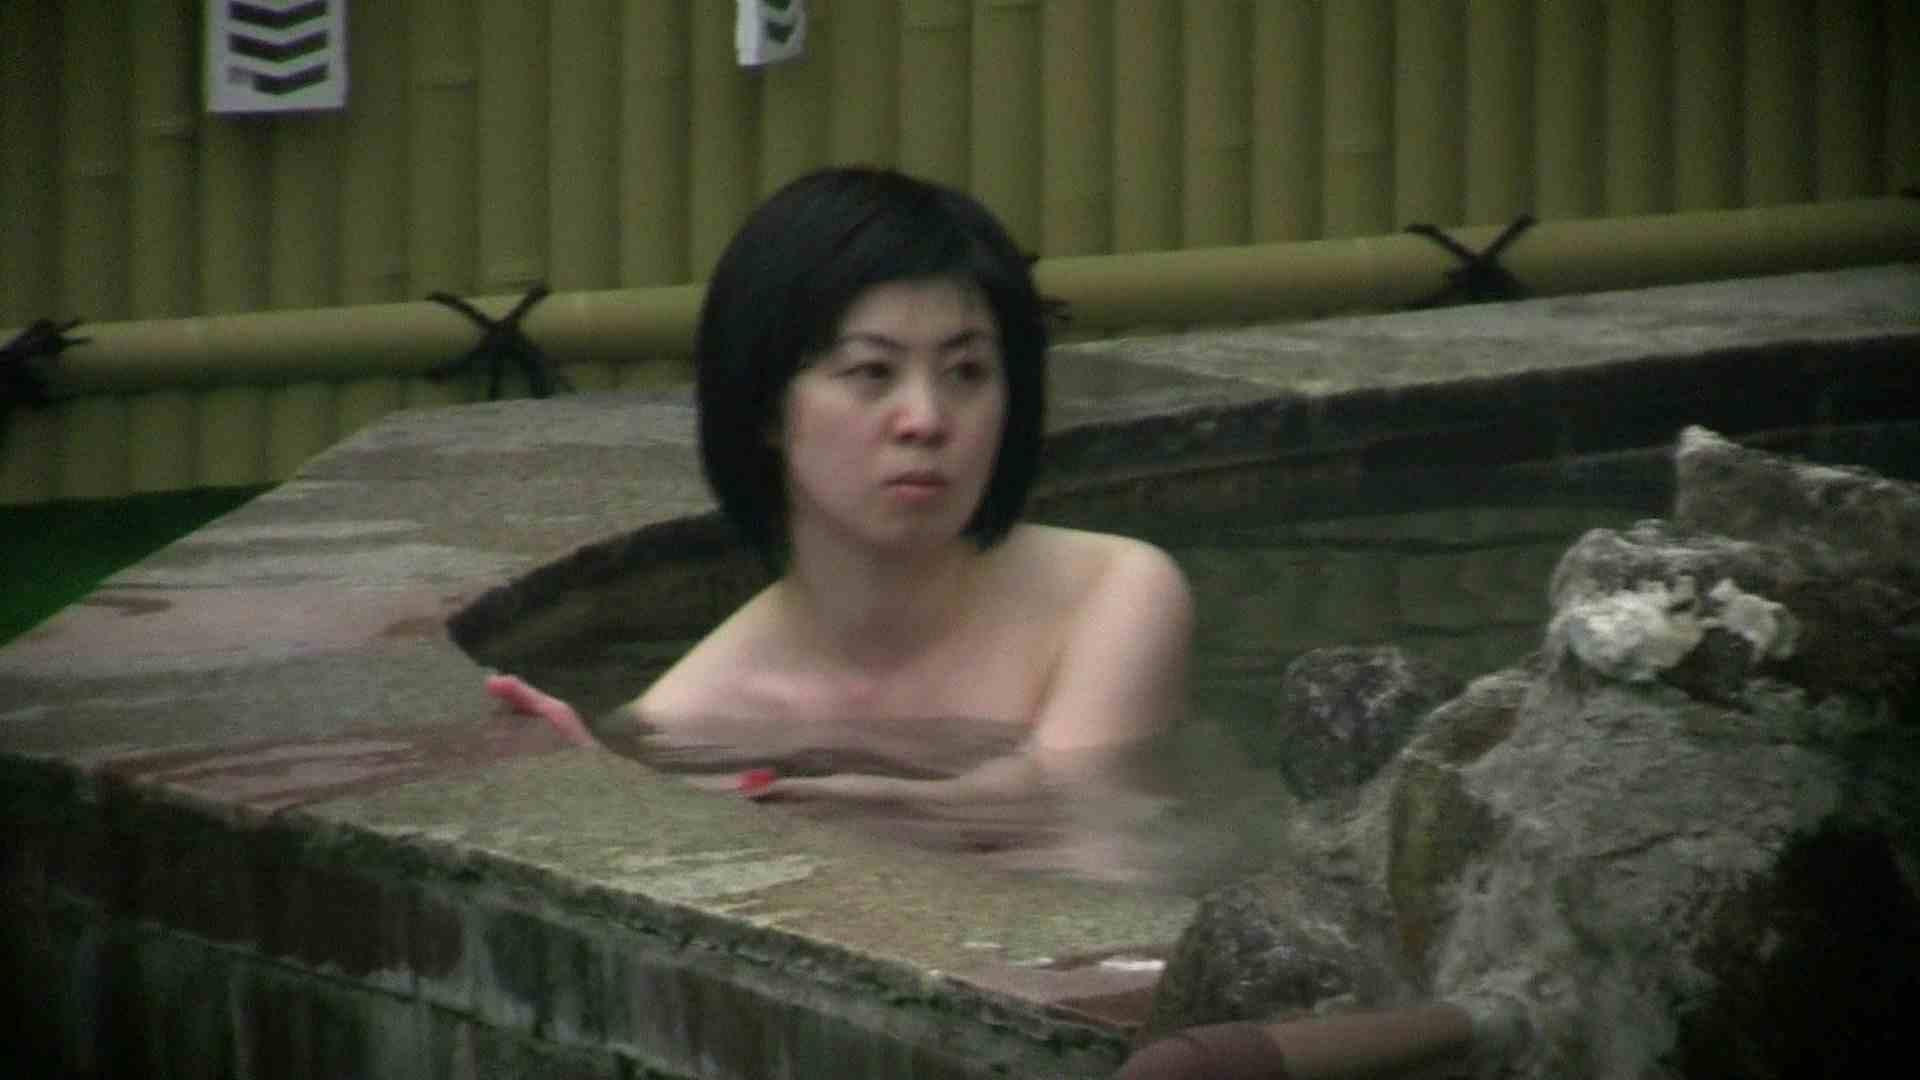 Aquaな露天風呂Vol.685 盗撮シリーズ | 露天風呂編  95PIX 31